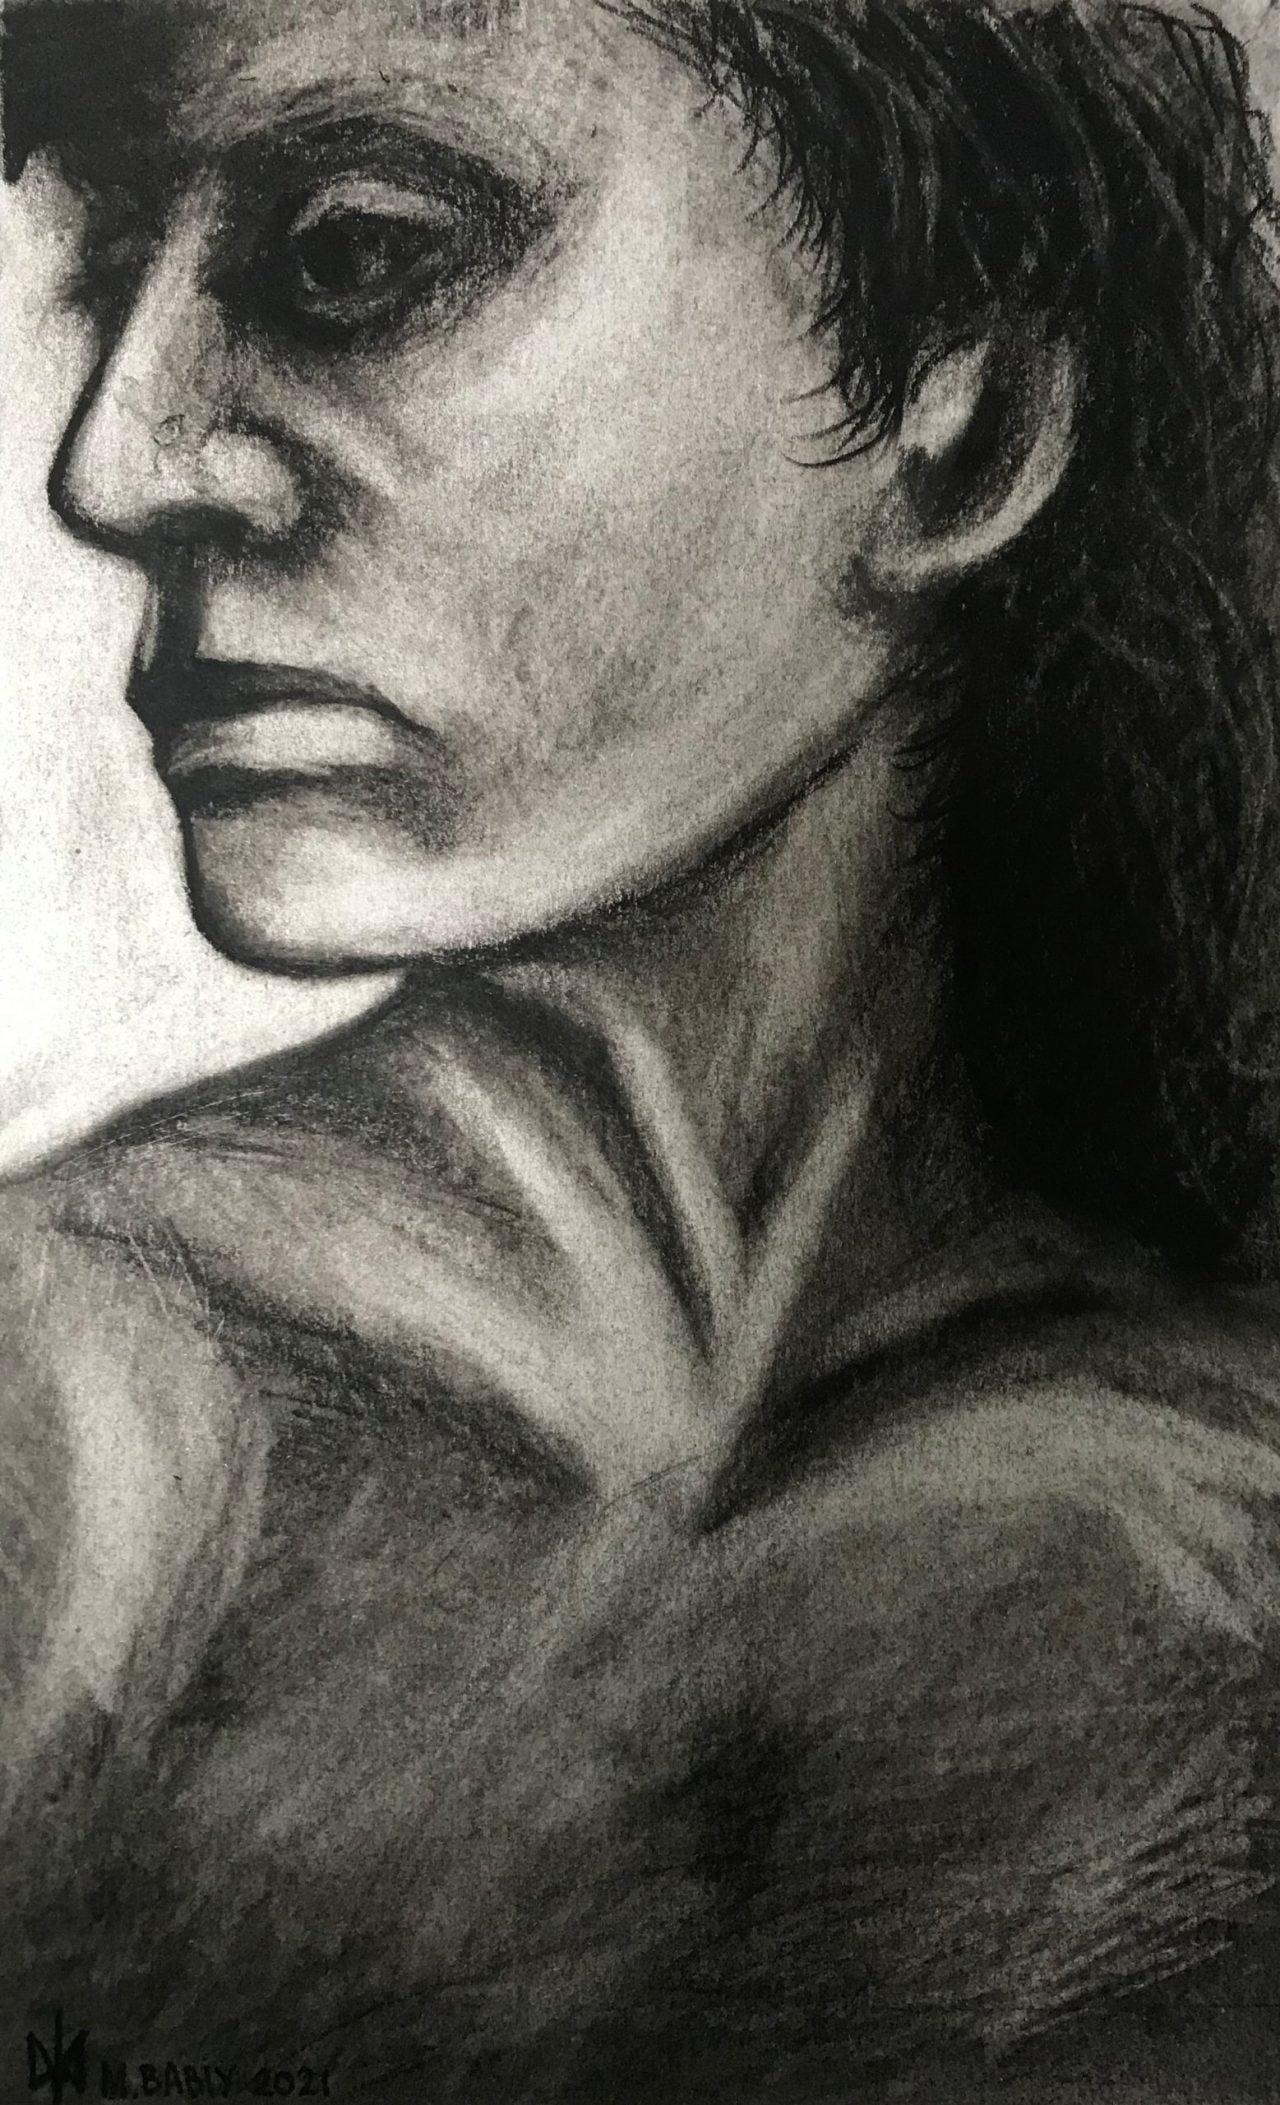 Women's head drawing. Charcoal drawing. Practicing. Mykola Babiy